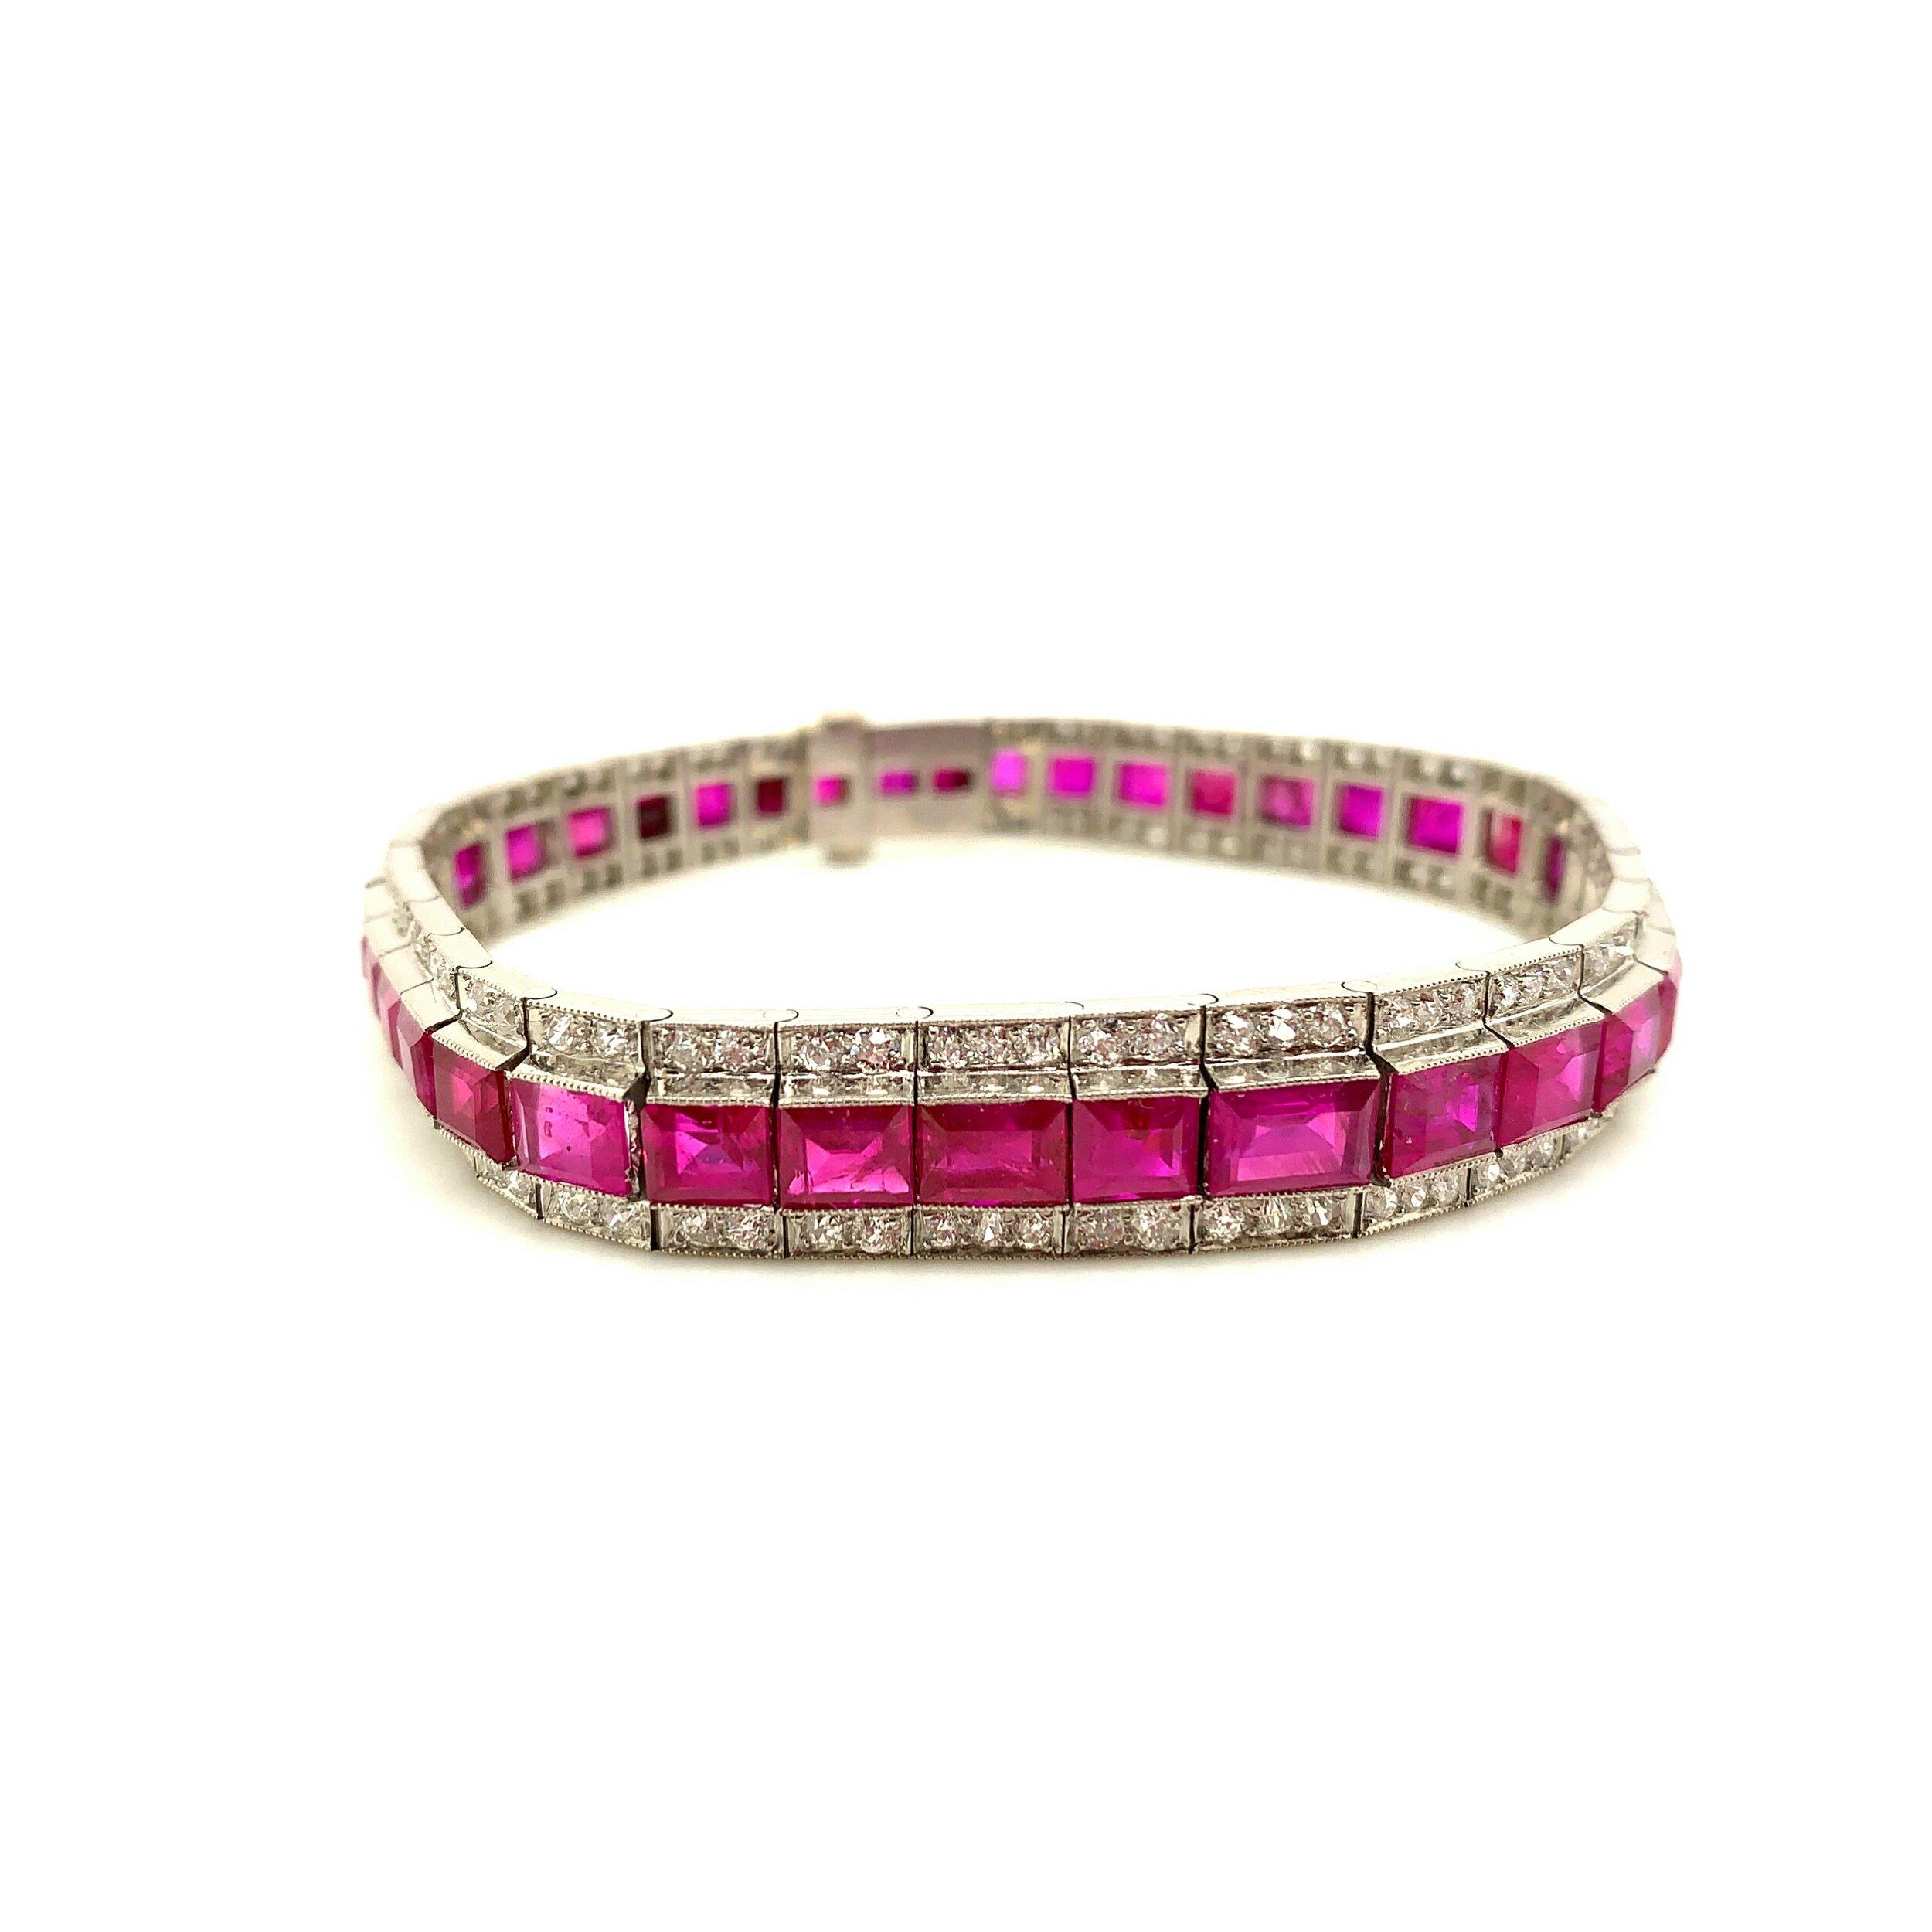 Ruby Straight Line Bracelet with Diamonds   Est. US$ 15,000-20,000